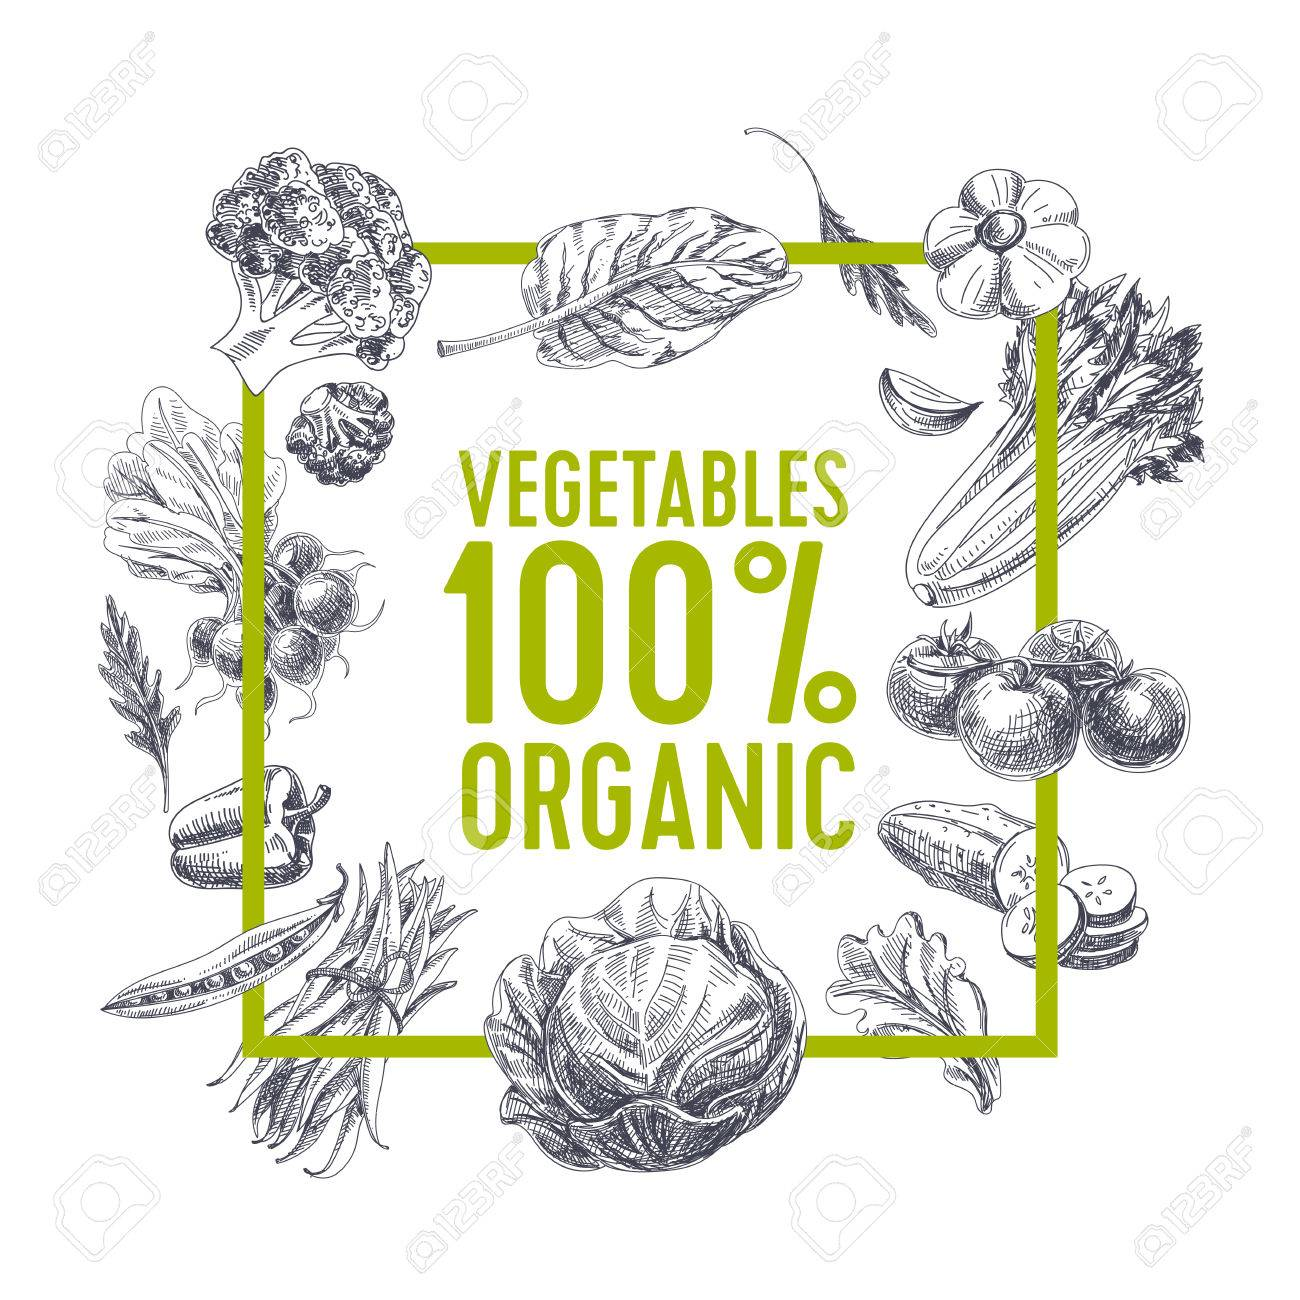 Vector hand drawn farm market Illustration. Vintage style. Retro organic food background. Locally grown sketch - 66667888